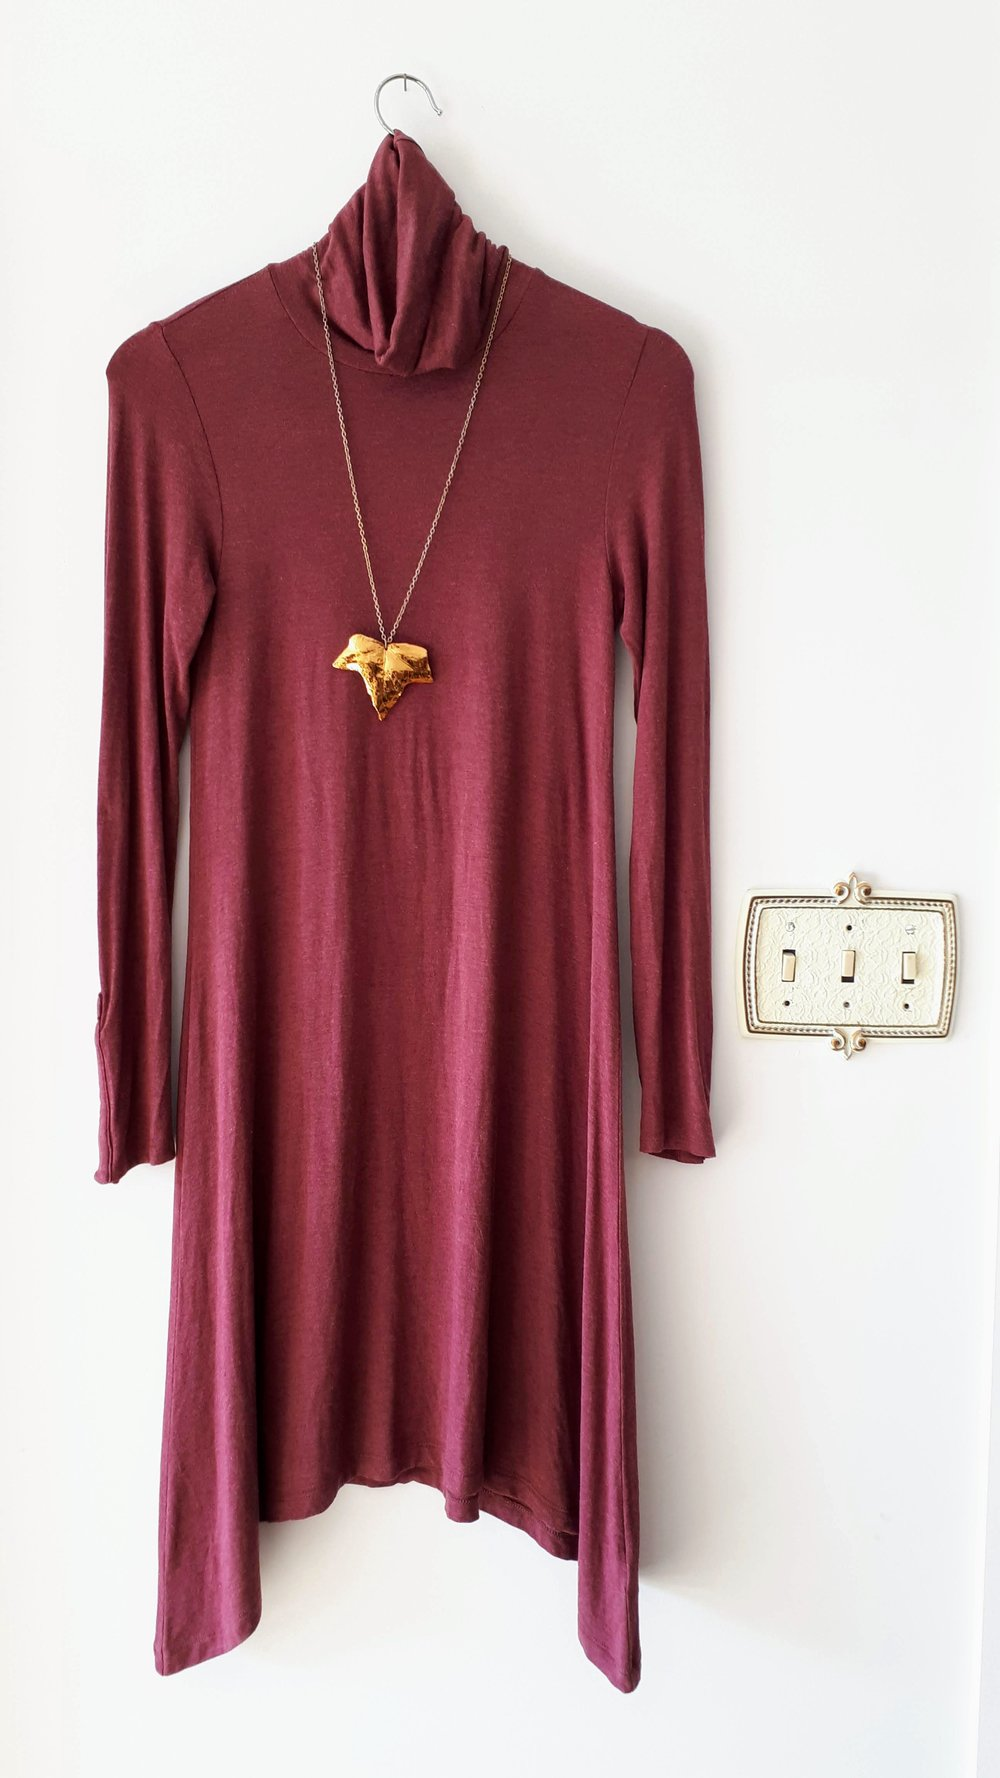 Maeve dress; Size XS, $42